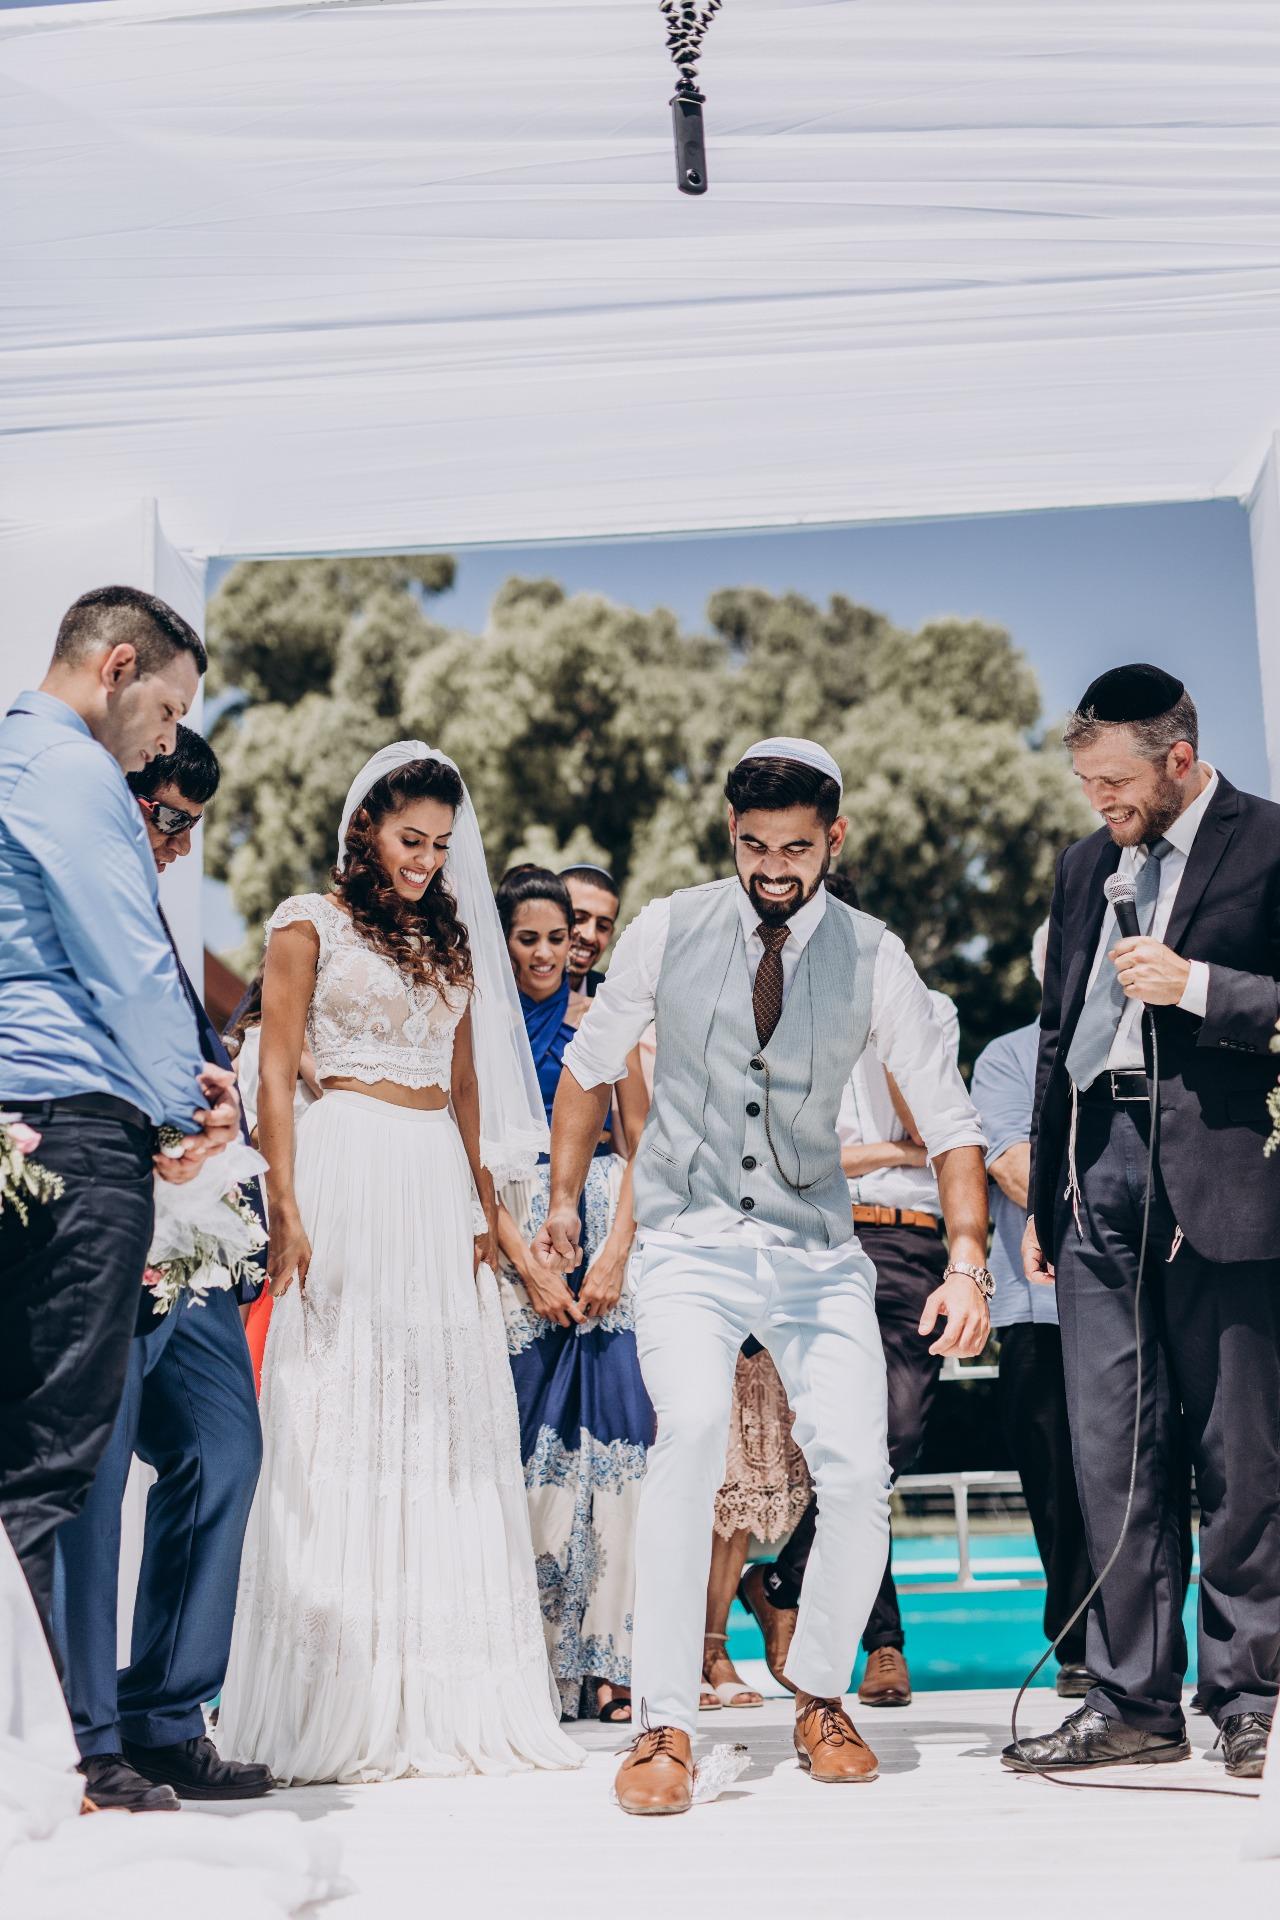 On The Dance Floor: החתונה של בר ואורי